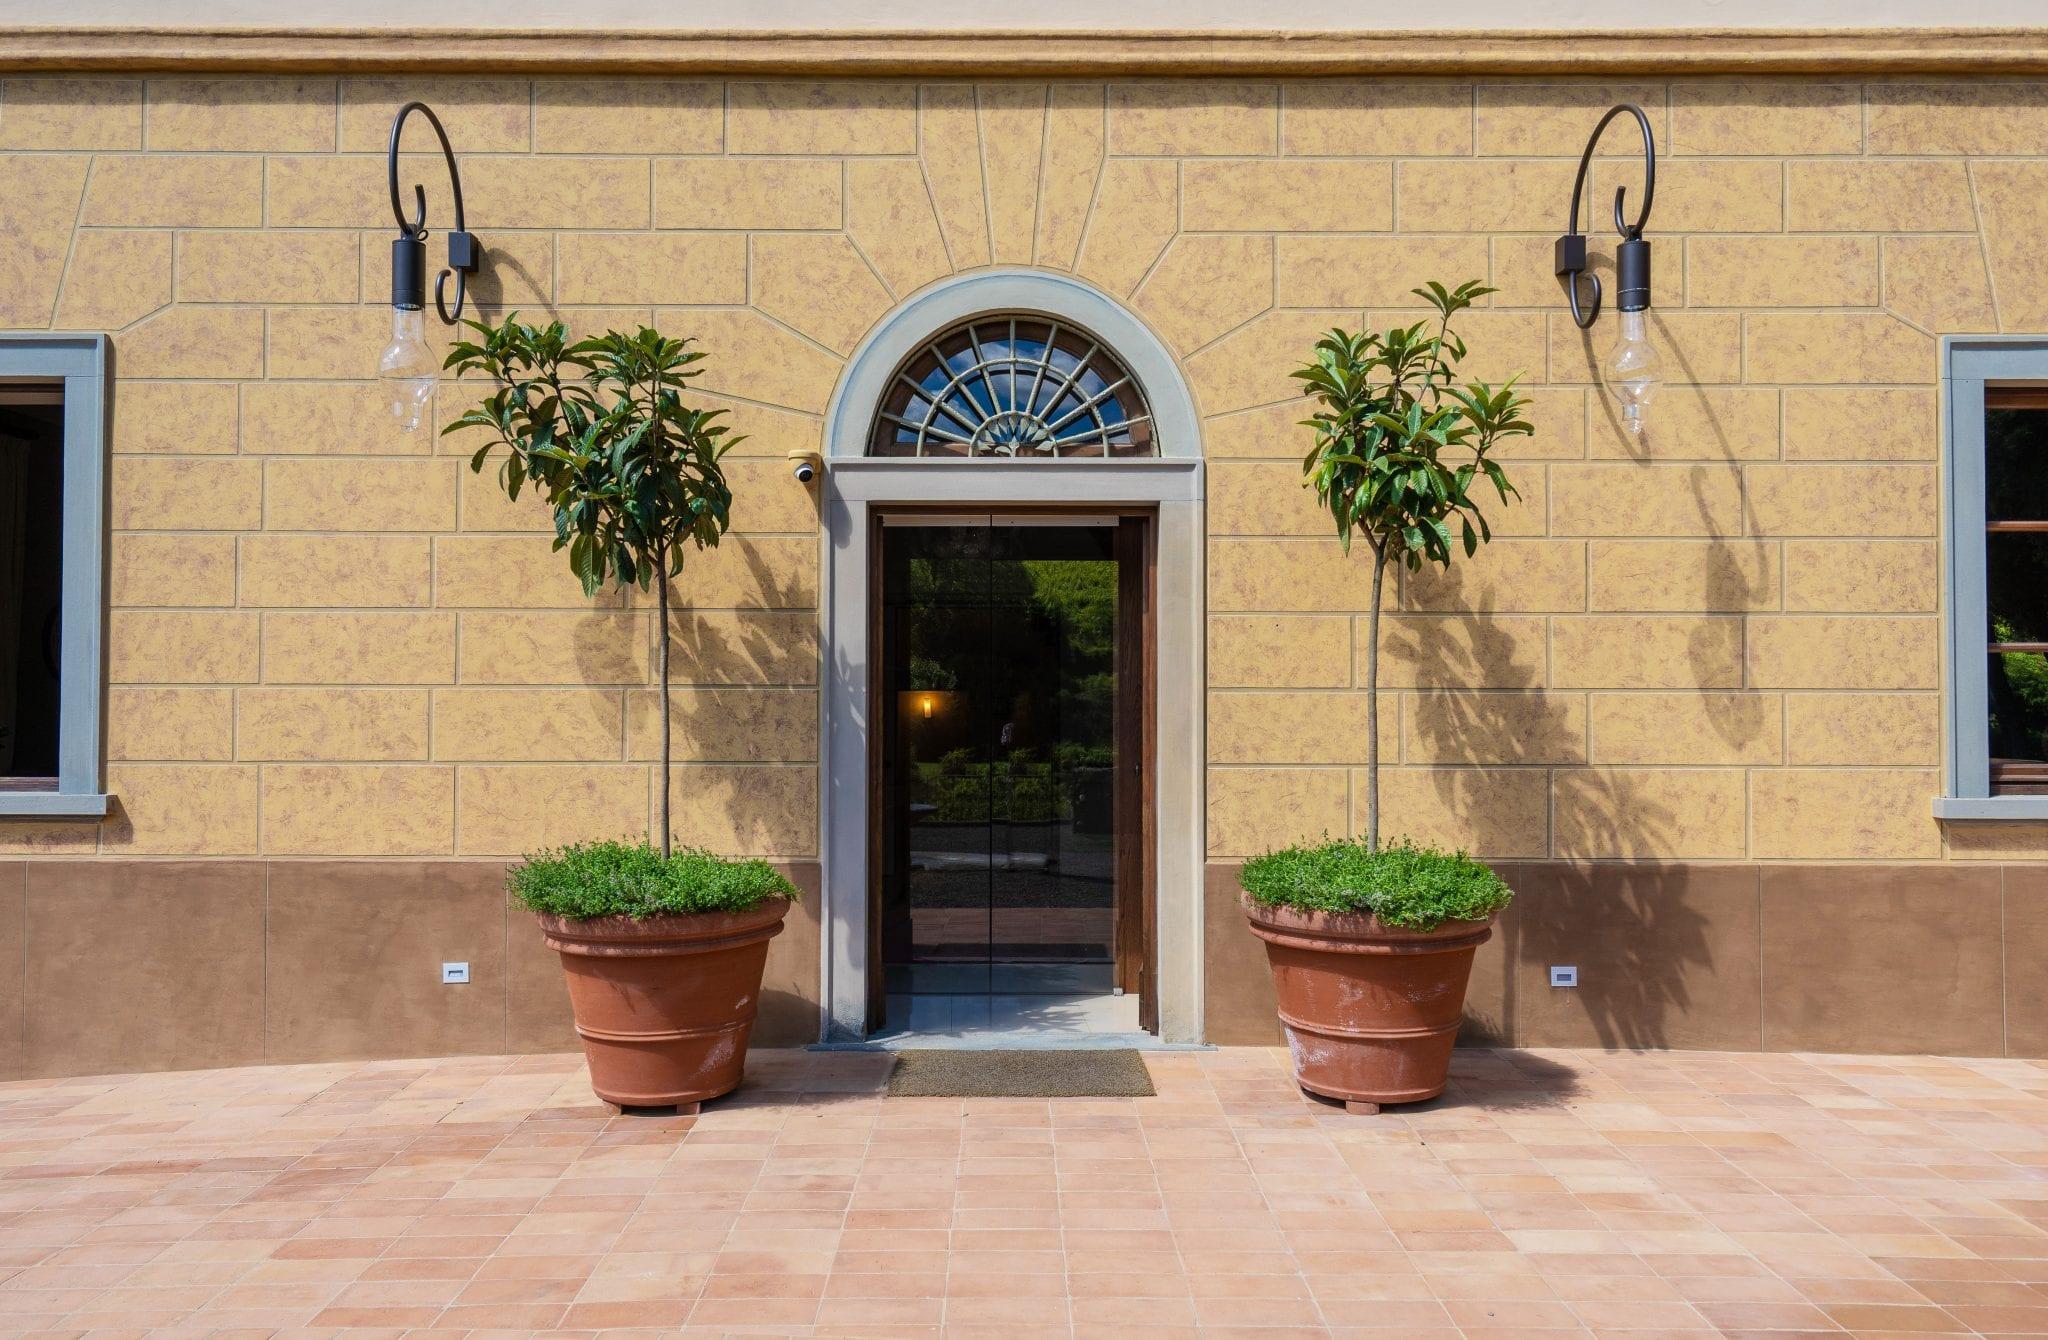 http://www.hotelvillacampomaggio.it/wp-content/uploads/2021/07/facciata-ingresso.jpg